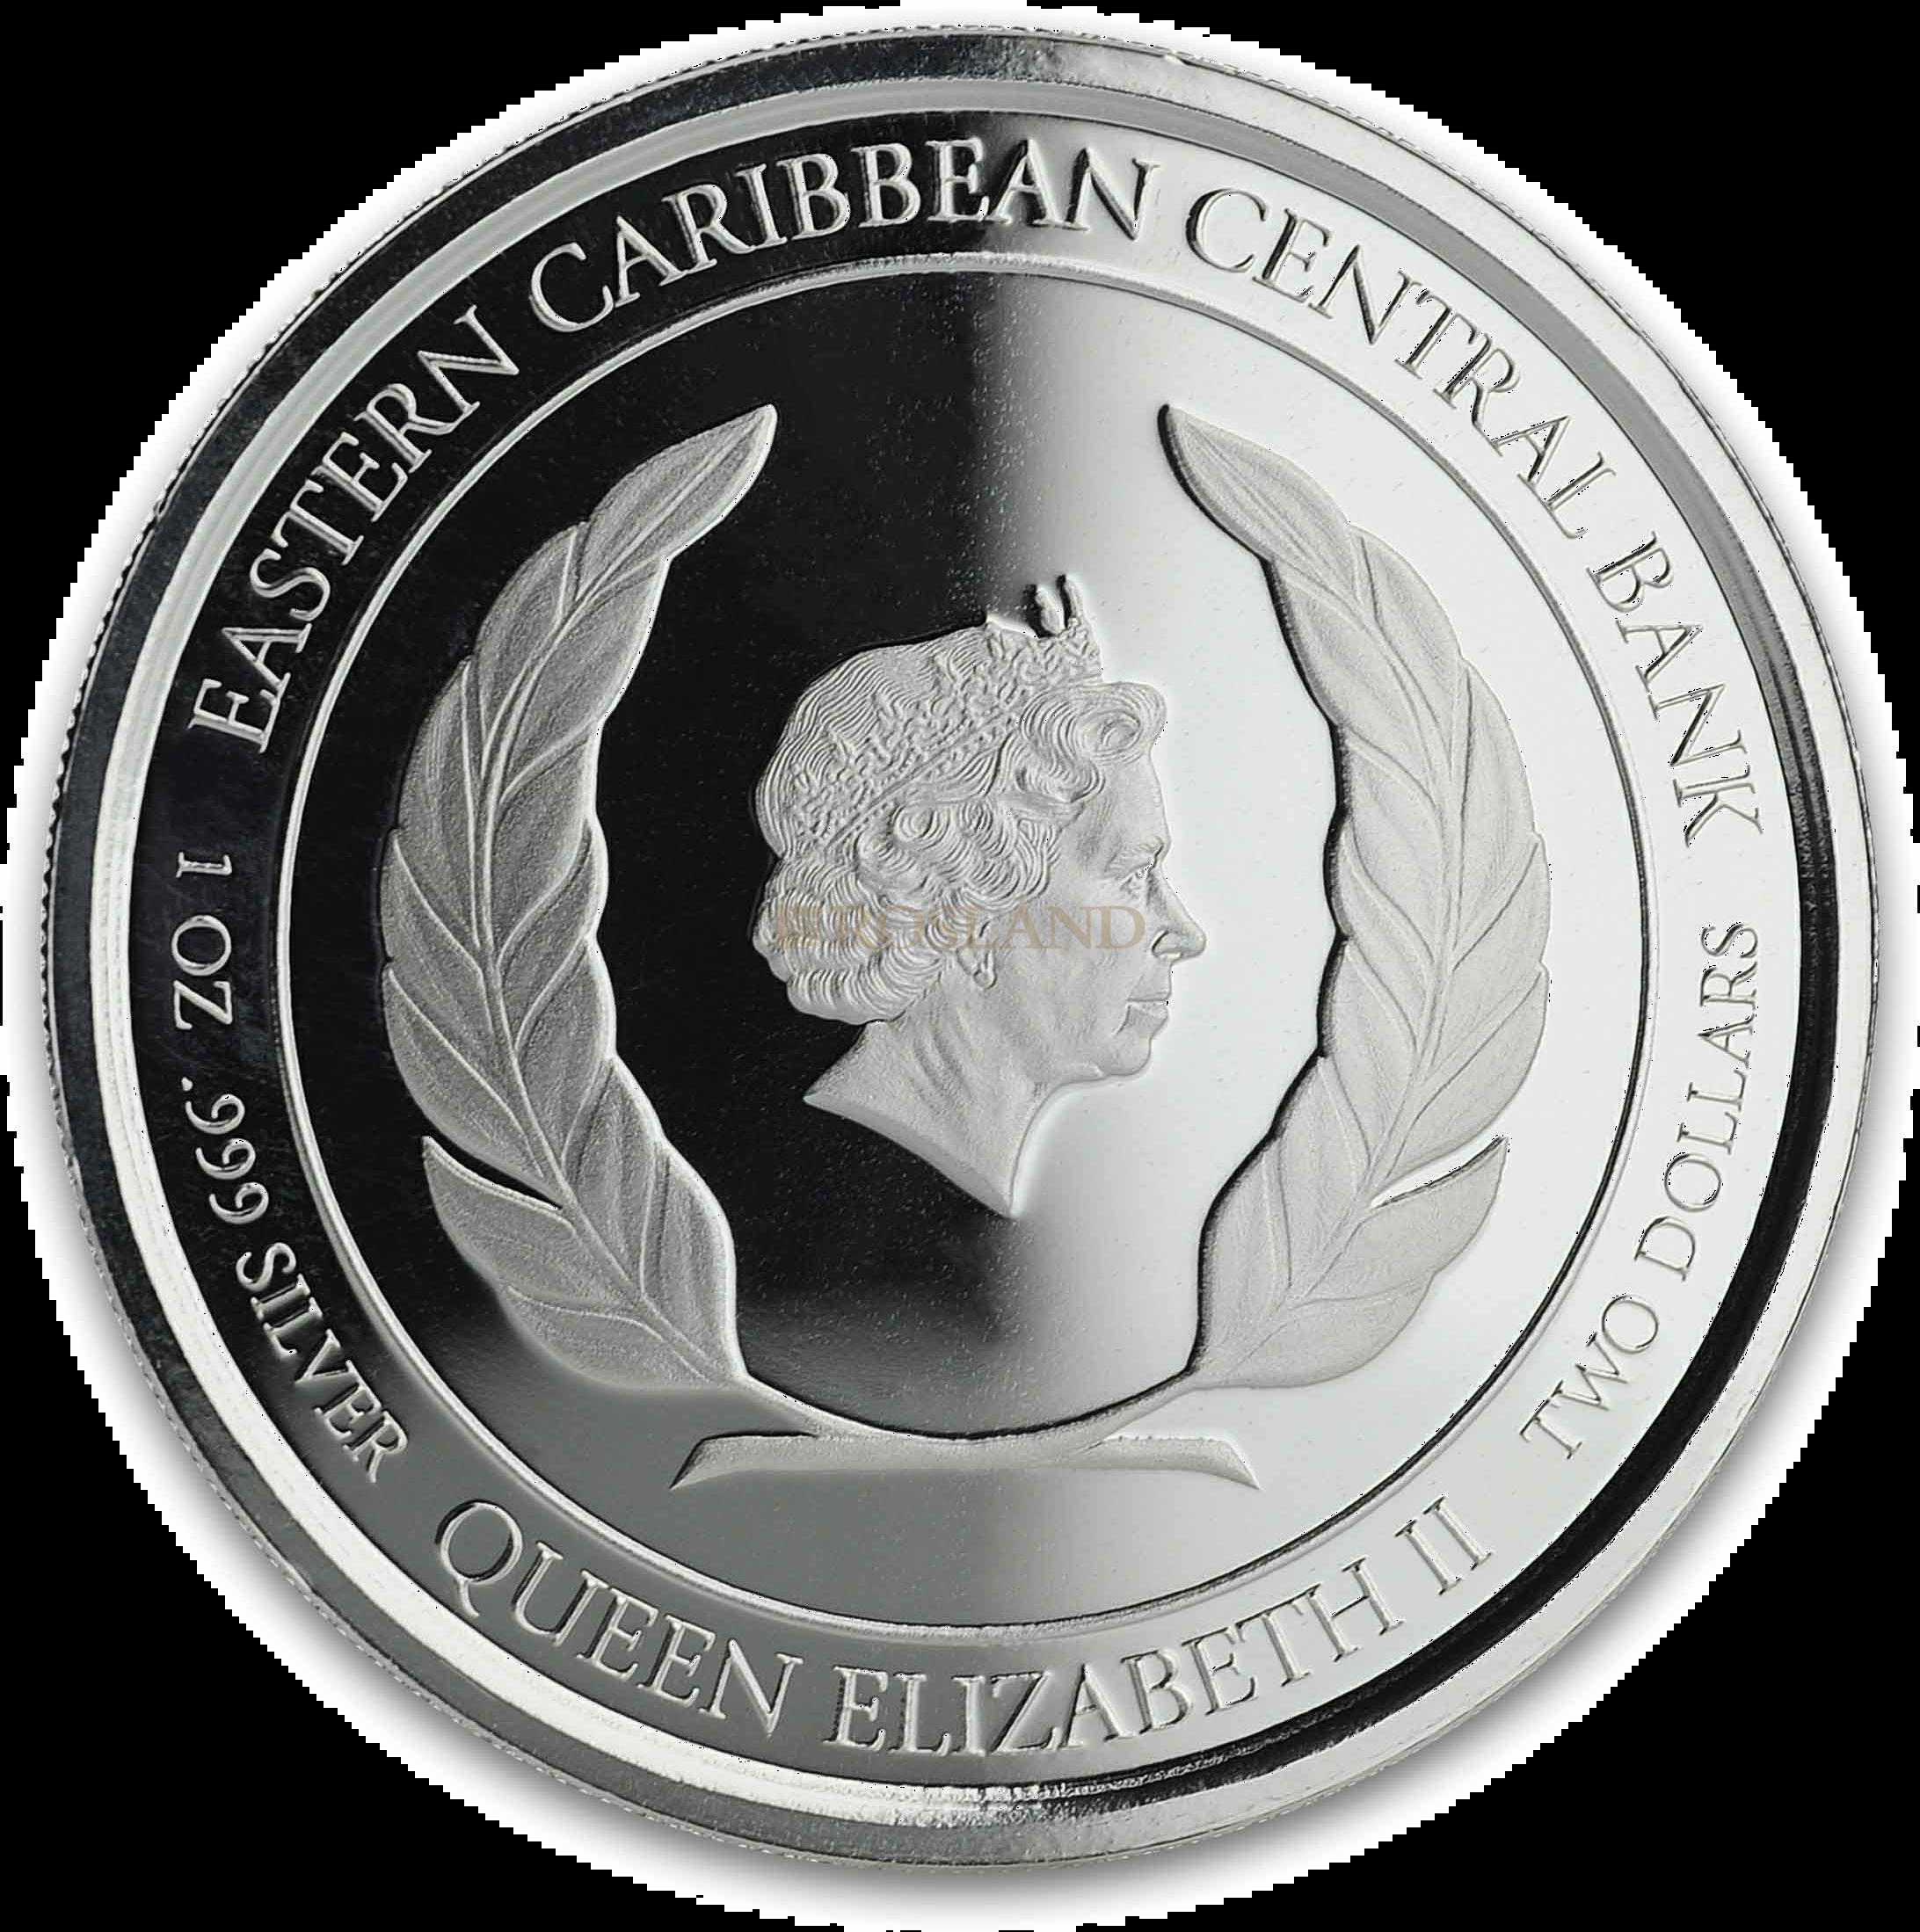 1 Unze Silbermünze EC8 Montserrat Emerald Isle of the Caribbean 2019 PP (Koloriert, Box)